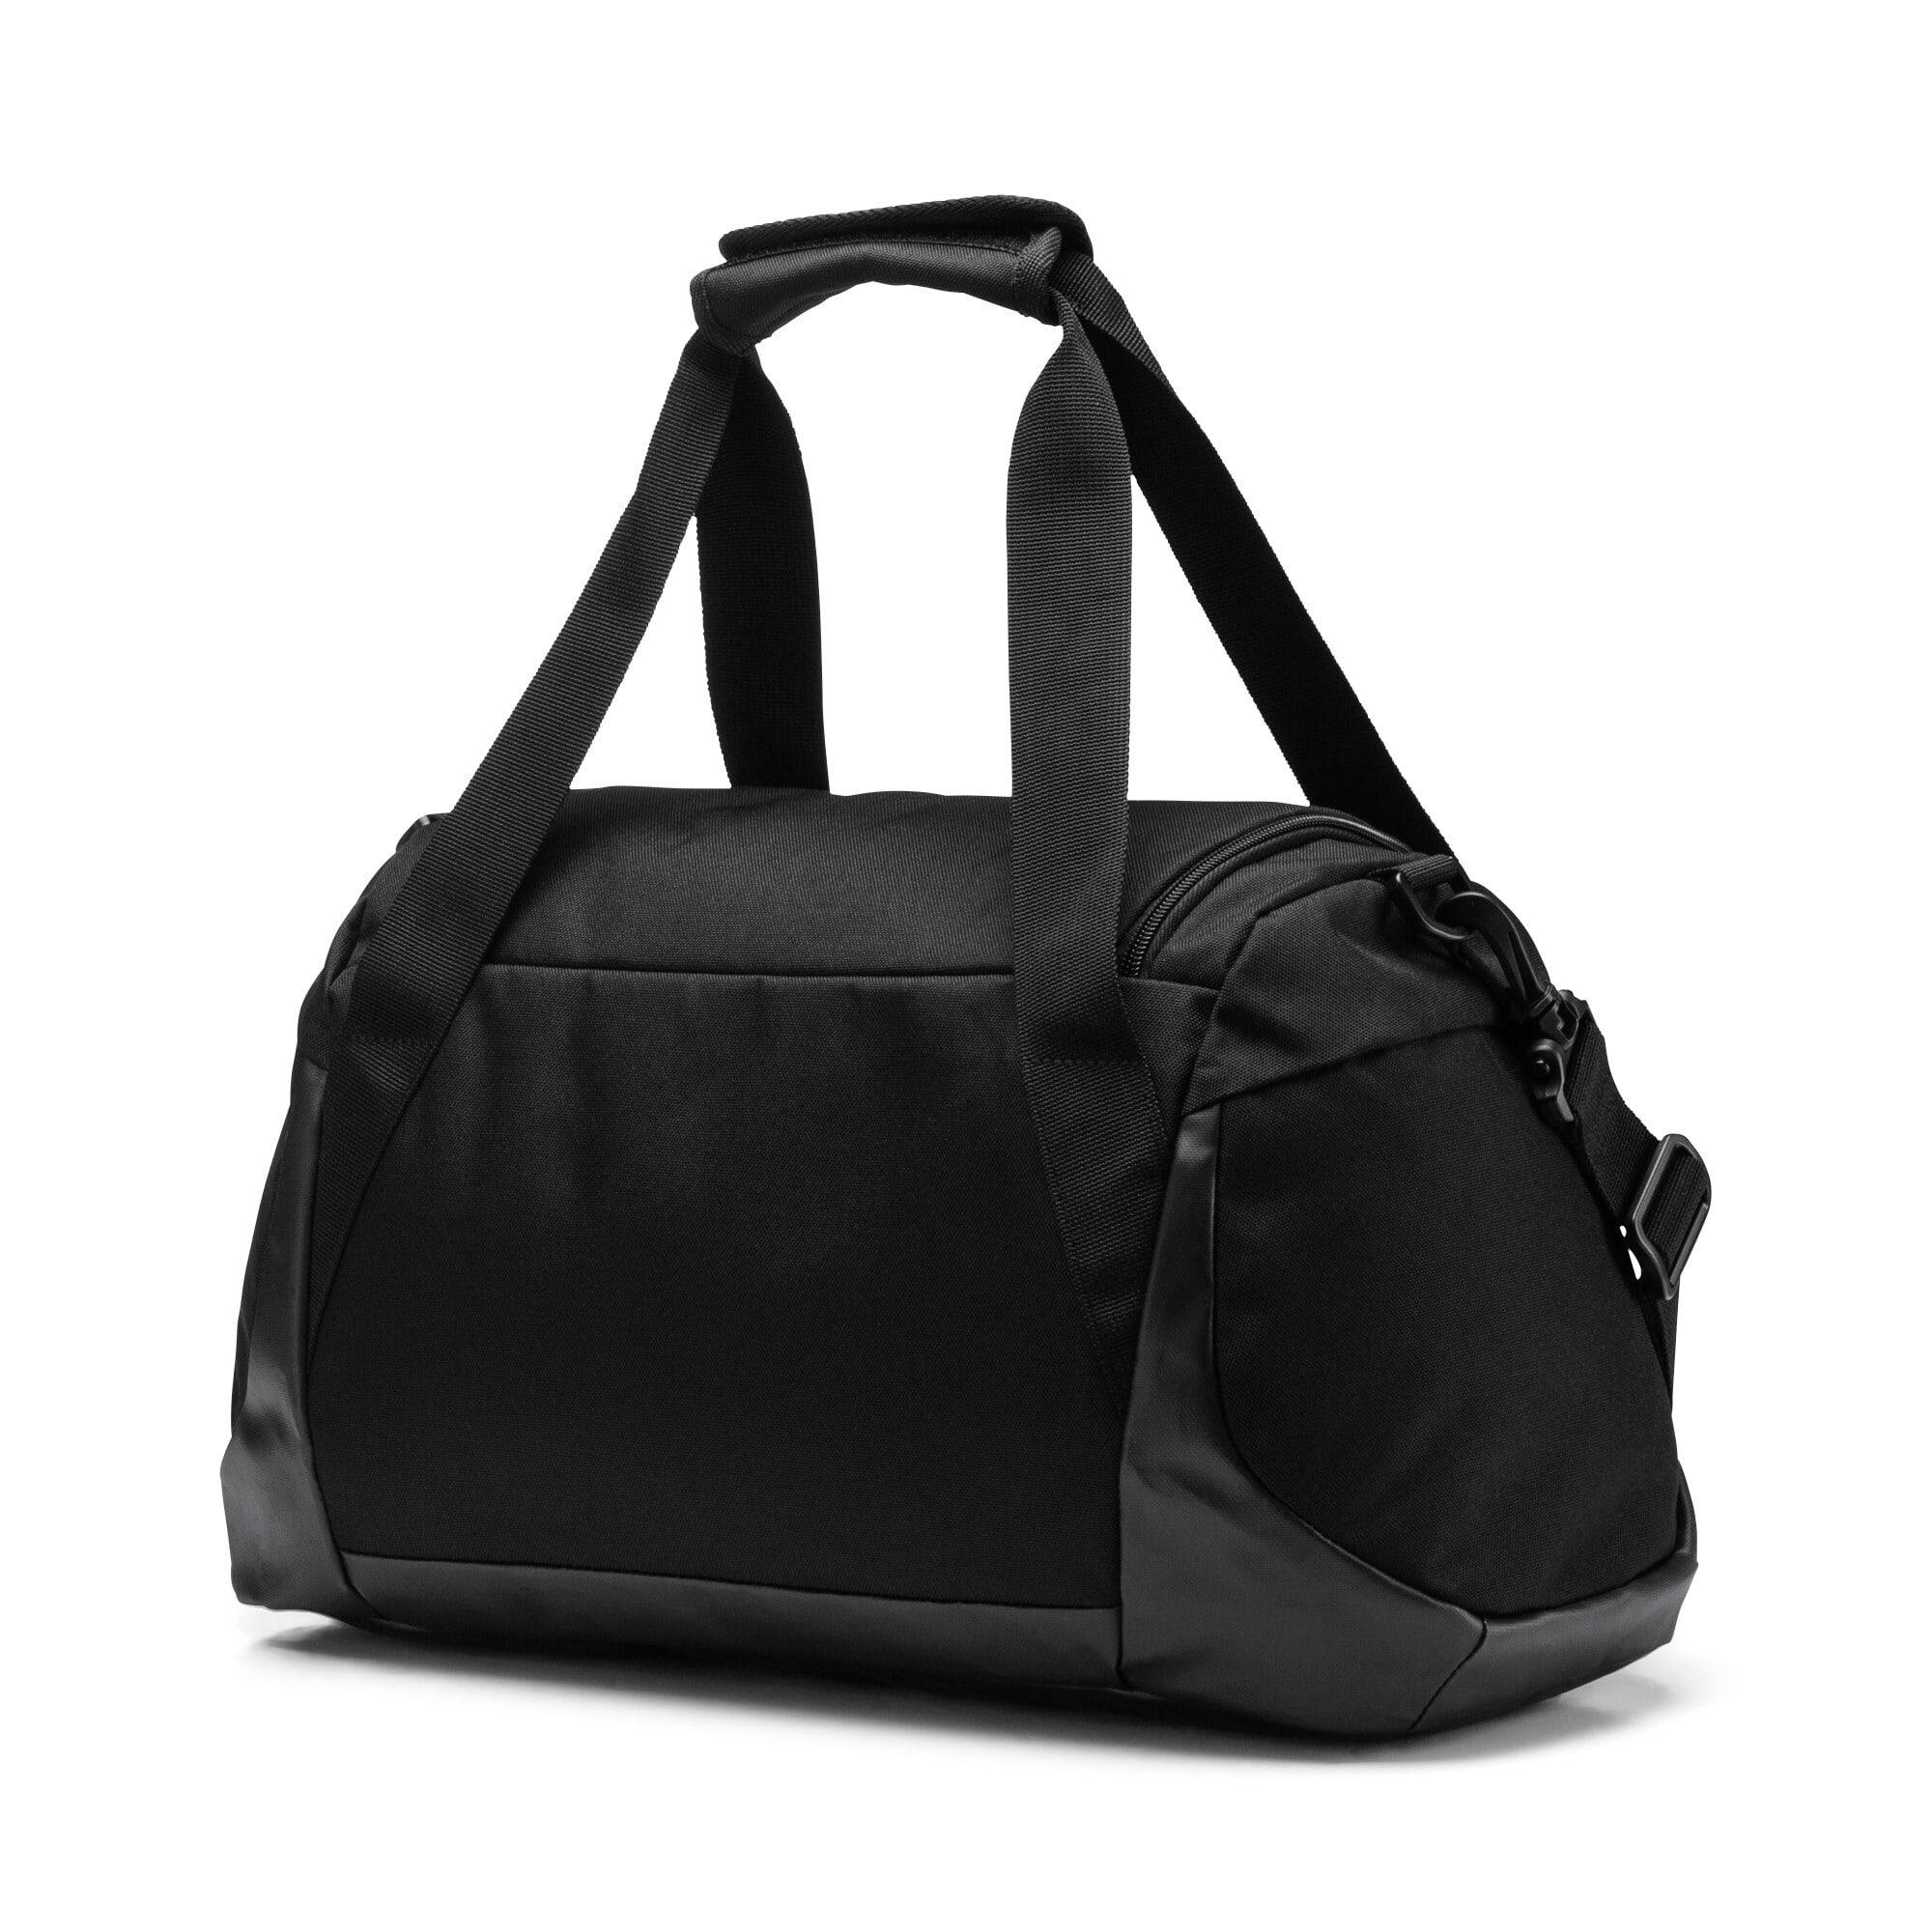 Thumbnail 2 of Gym Duffel Bag, Puma Black, medium-IND